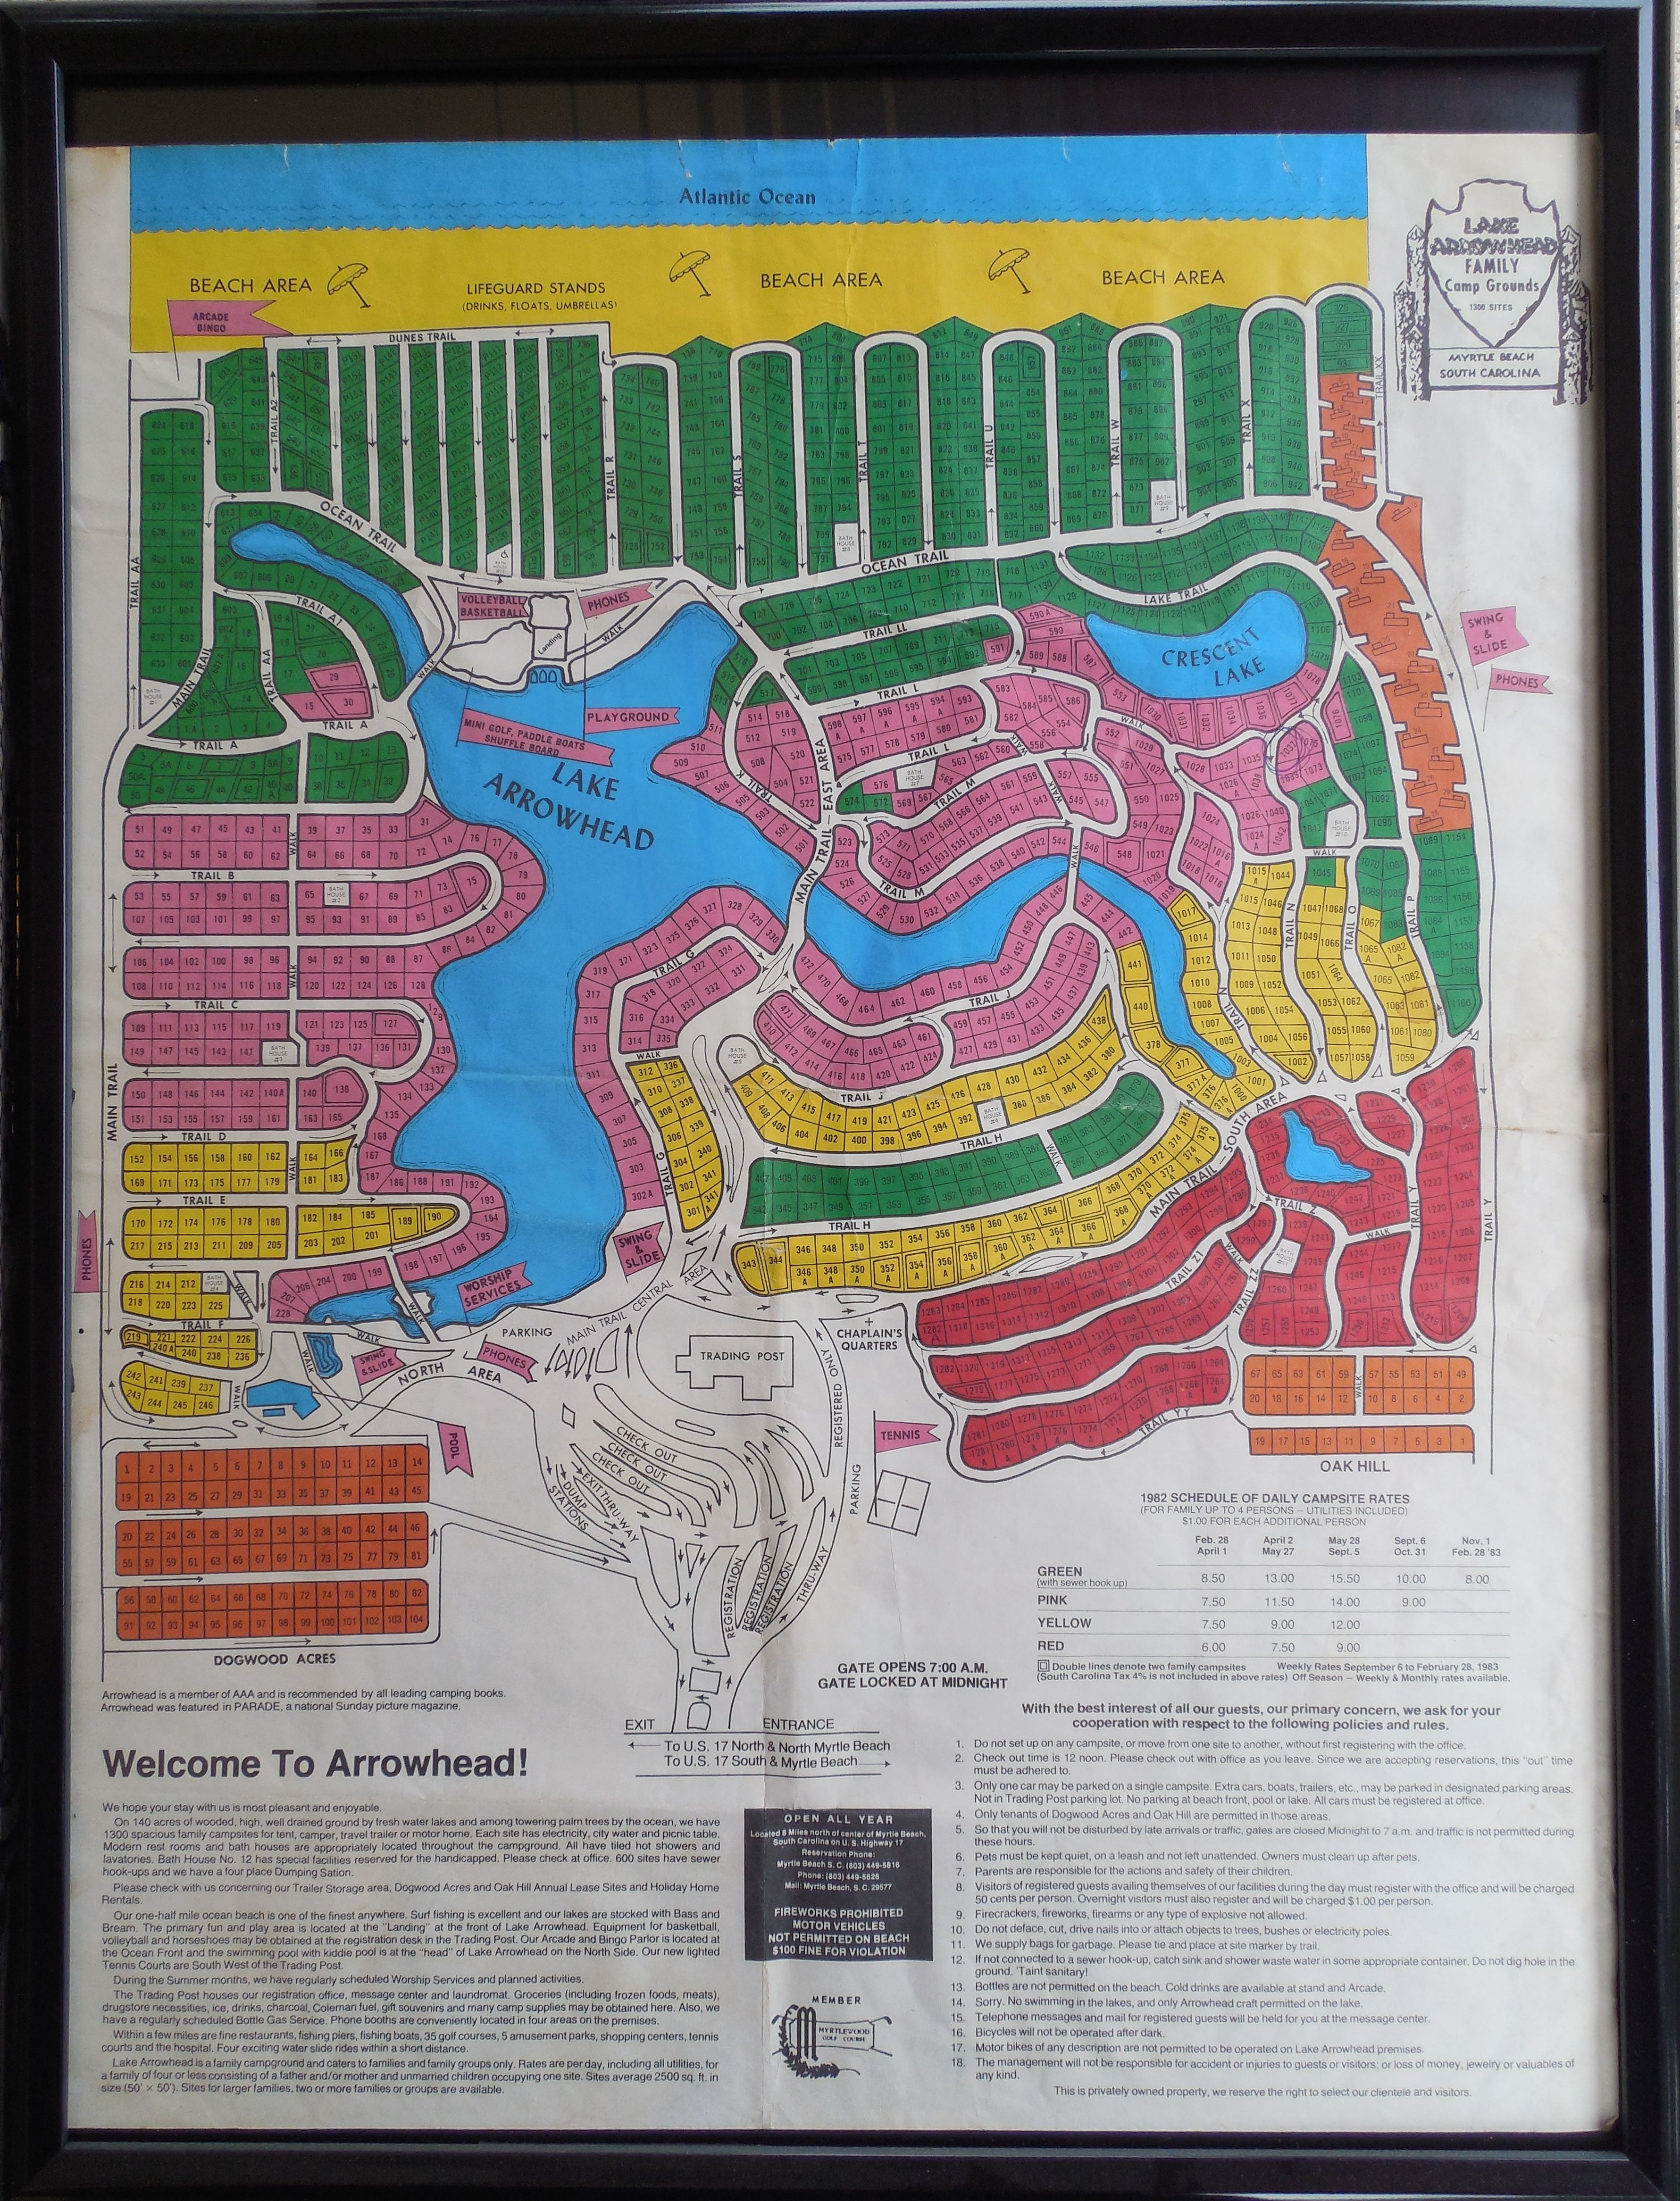 37+ Blue lake fine arts camp map information